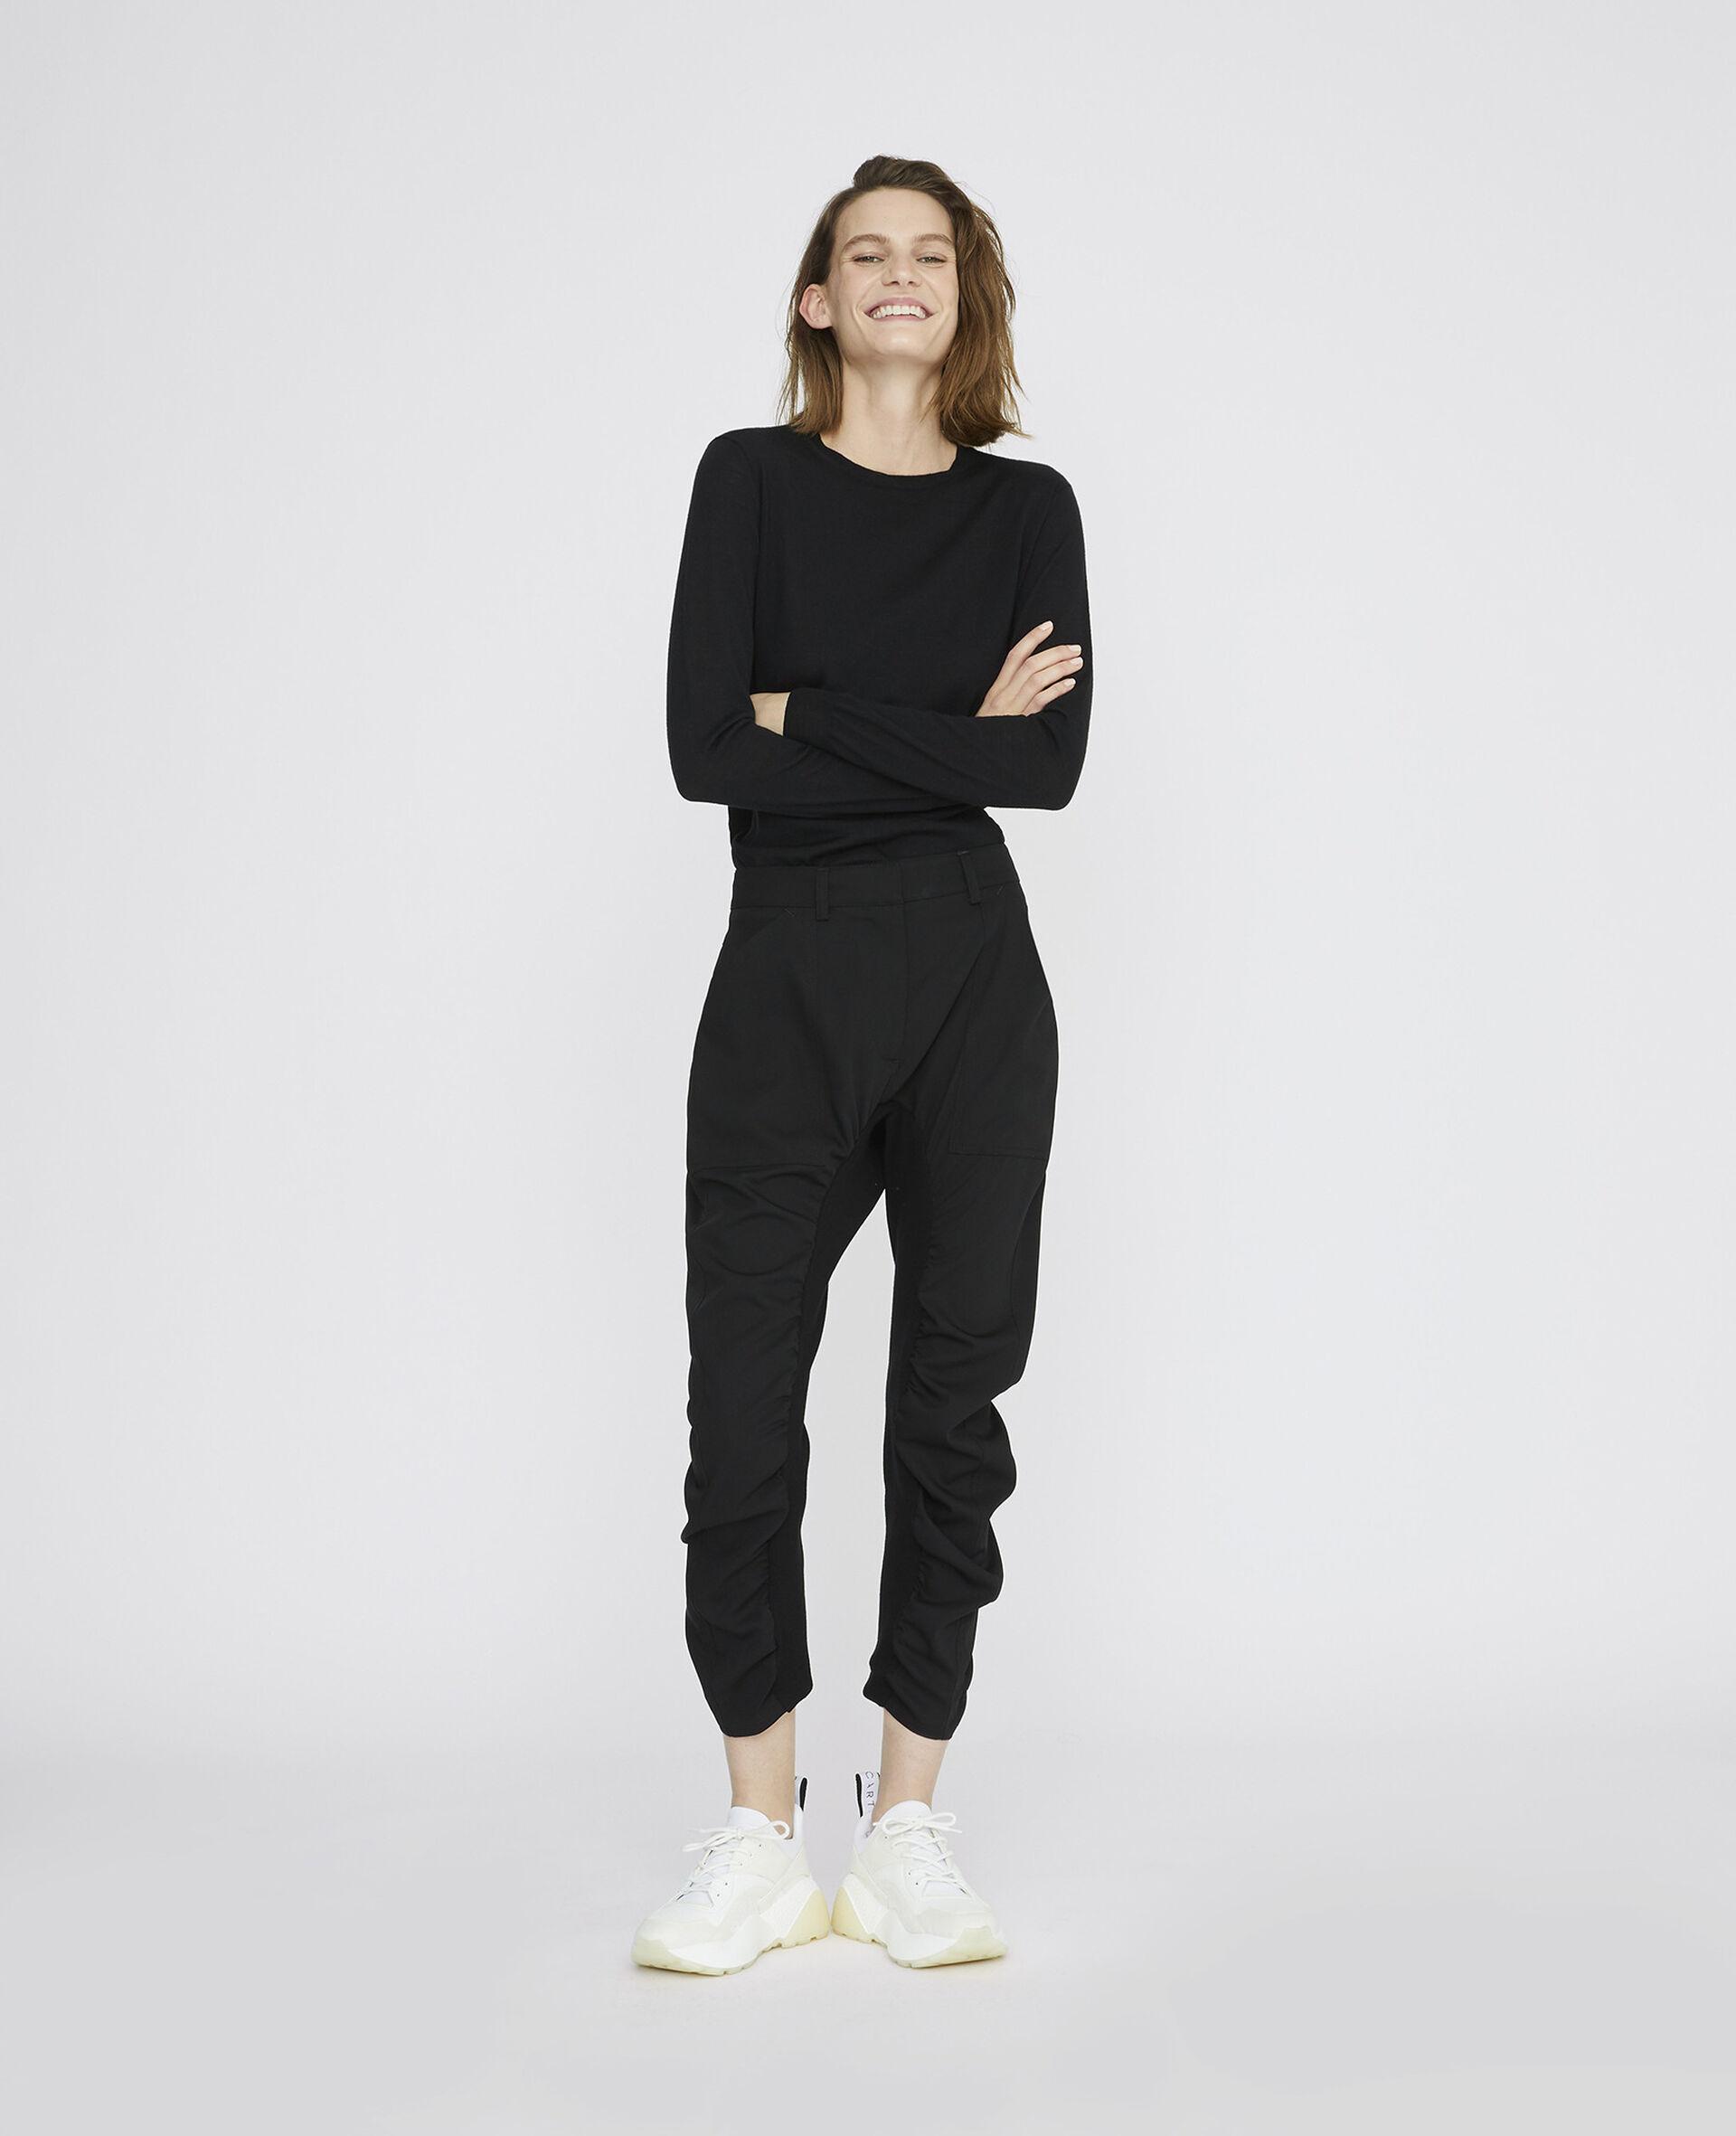 Pantaloni Tina Neri-Nero-large image number 1